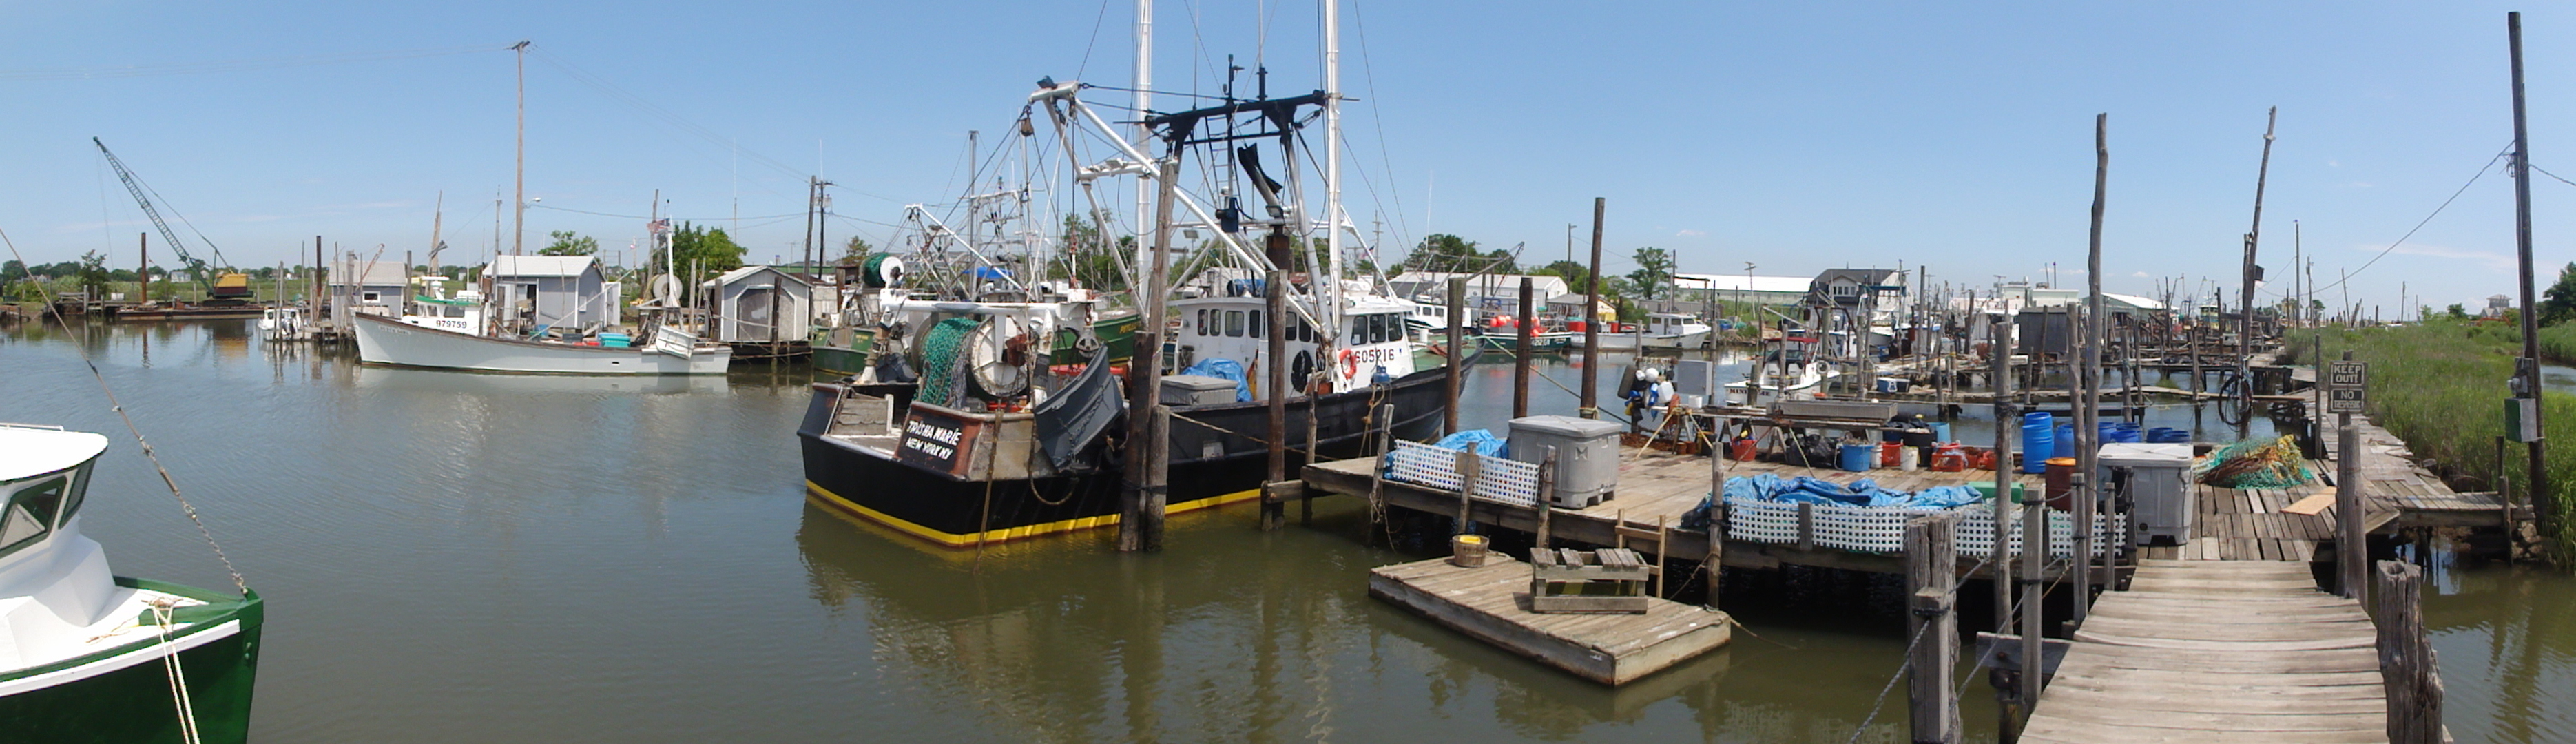 File:930 Belford Harbour, NJ.JPG - Wikipedia